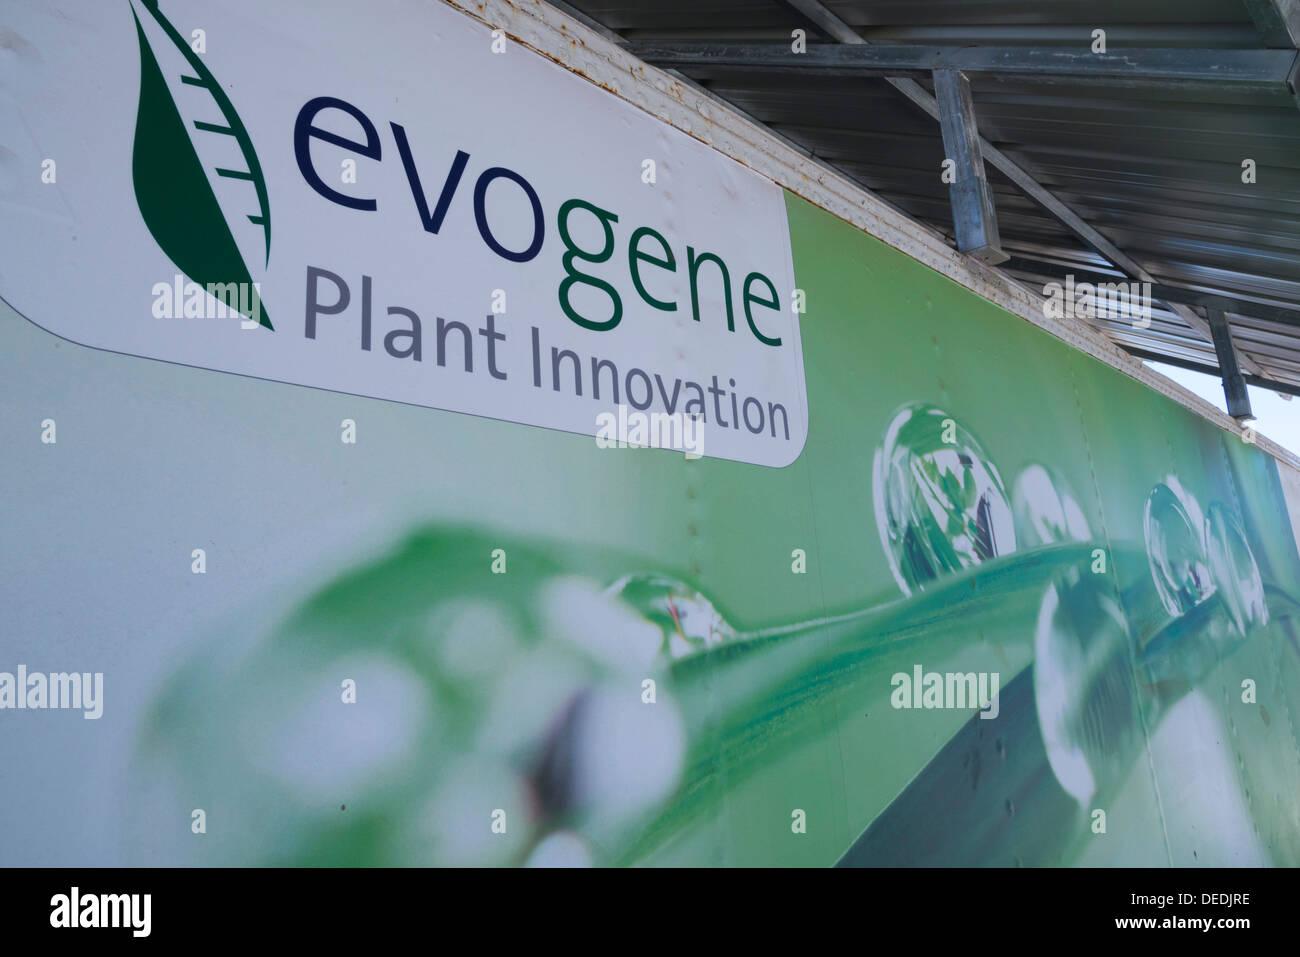 Evogene. genetically modified crops. Rehovot. Israel. - Stock Image